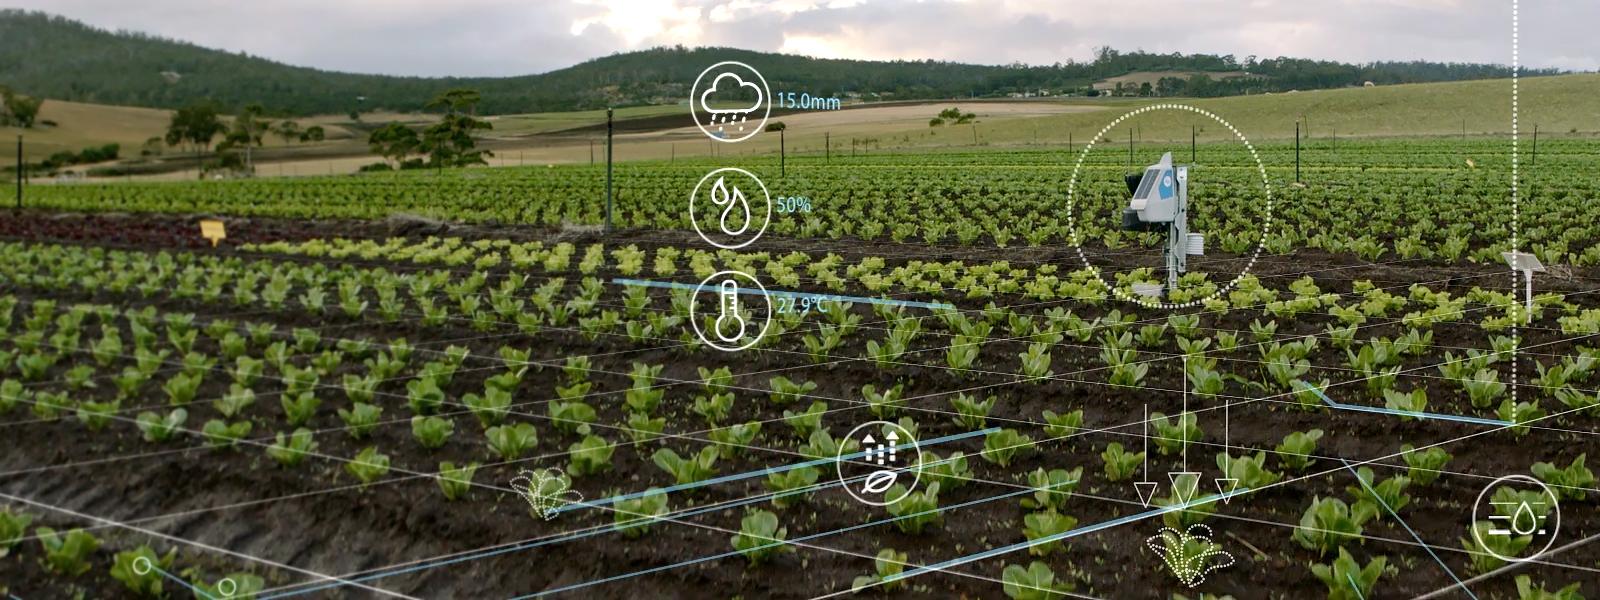 The Yield のデータを収集する AI 装置が設置された農場。